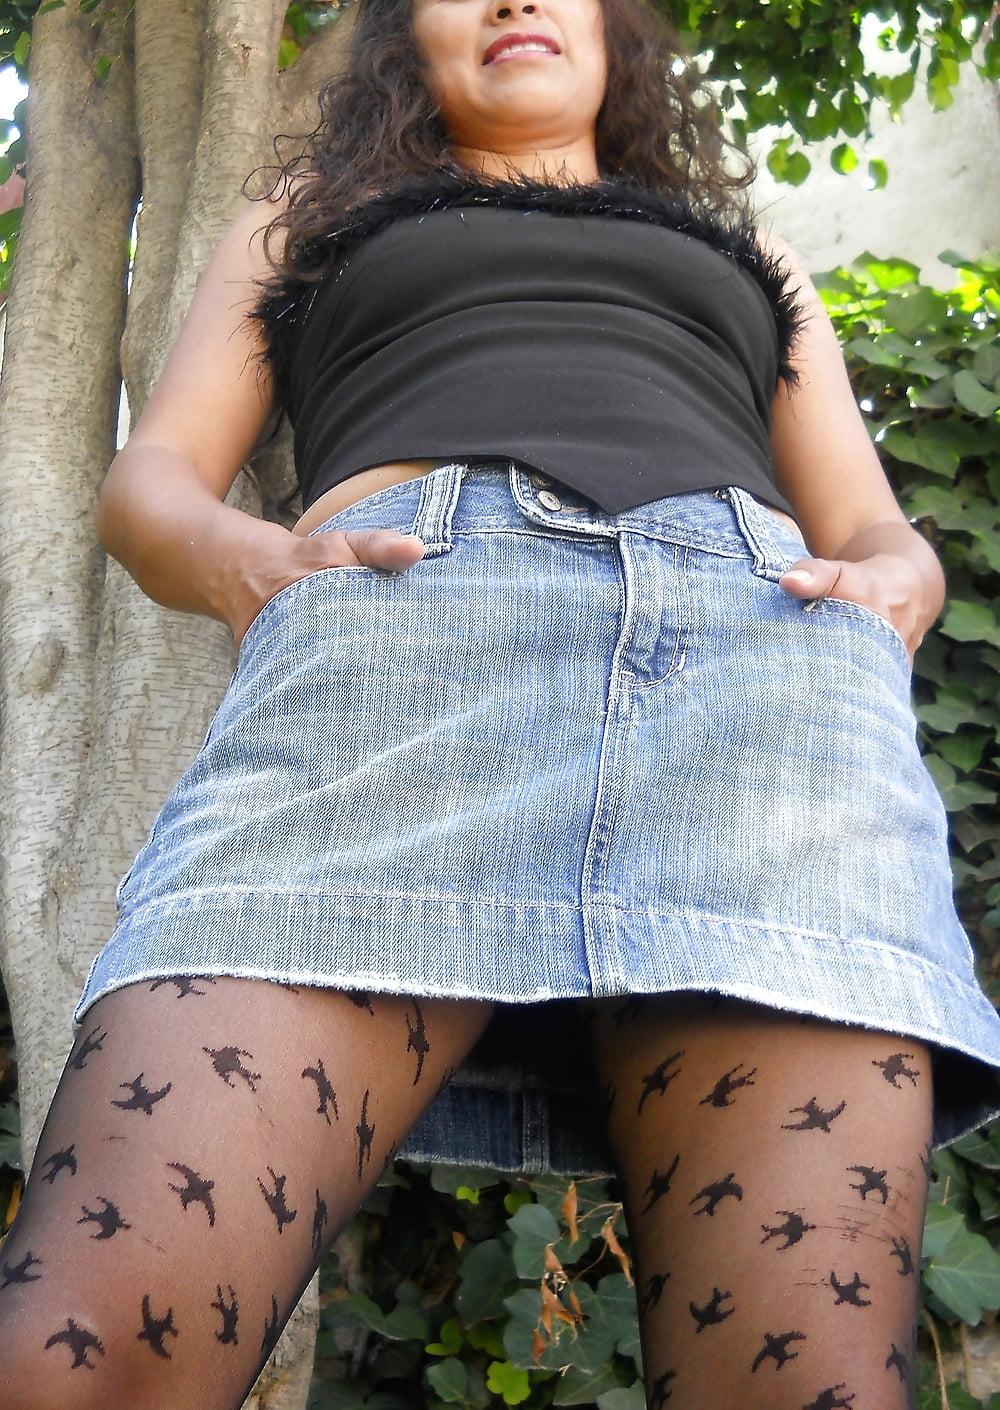 Pantyhose sexy milf-4709